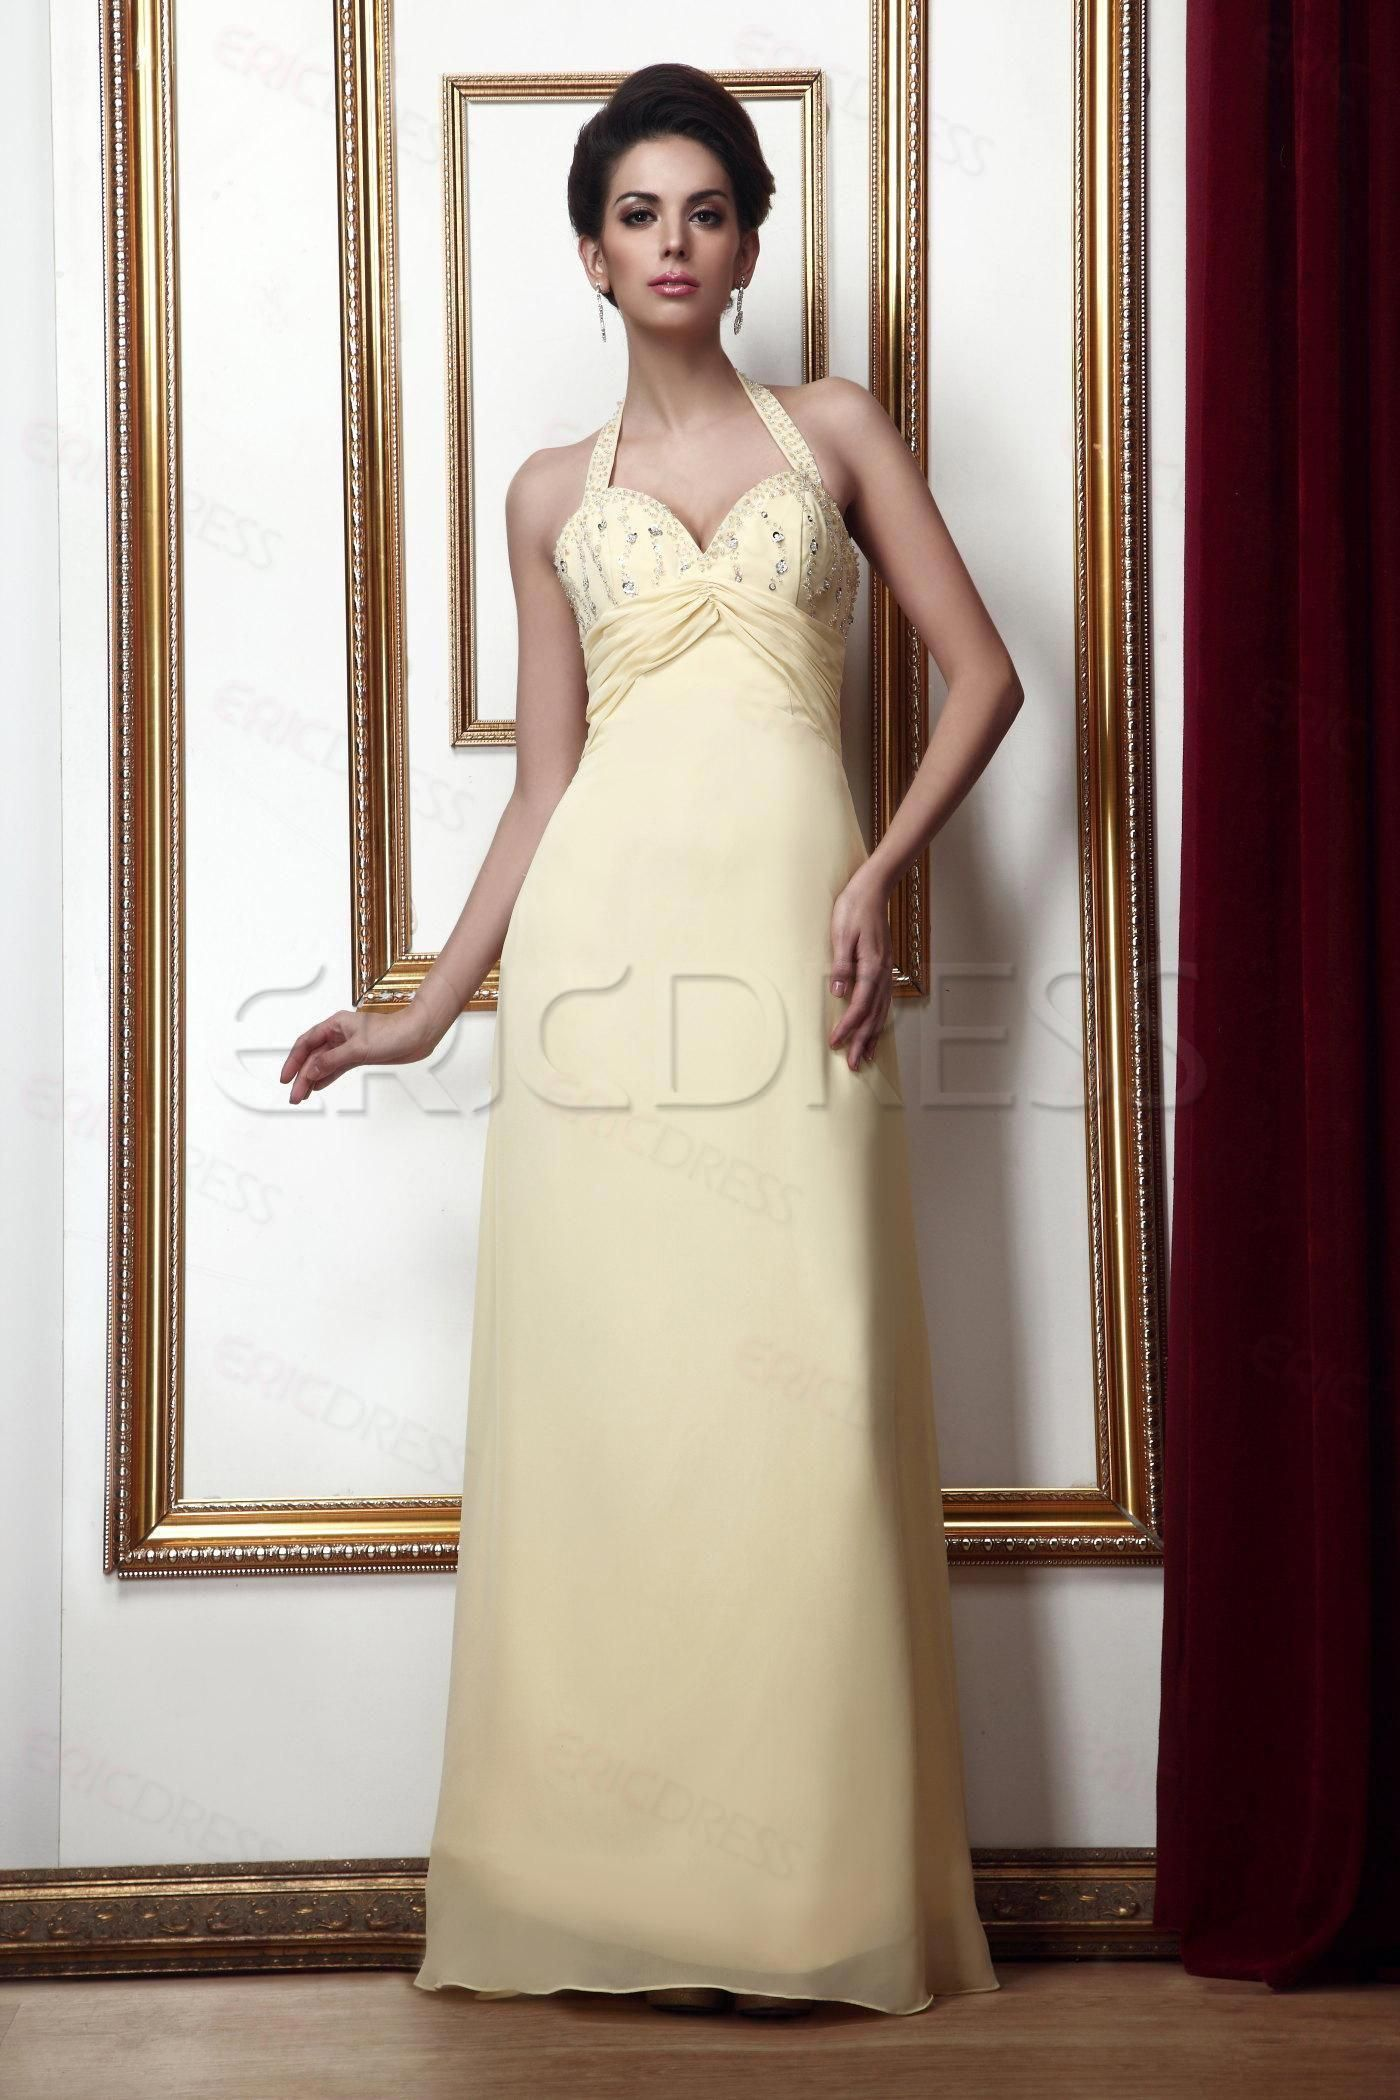 1952adde1a Women S Plus Size Knee Length Dresses  ShopPlusSizeWomenSClothing Code   8747922867  PlusSizeMotherOfTheBrideDressesHoustonTx